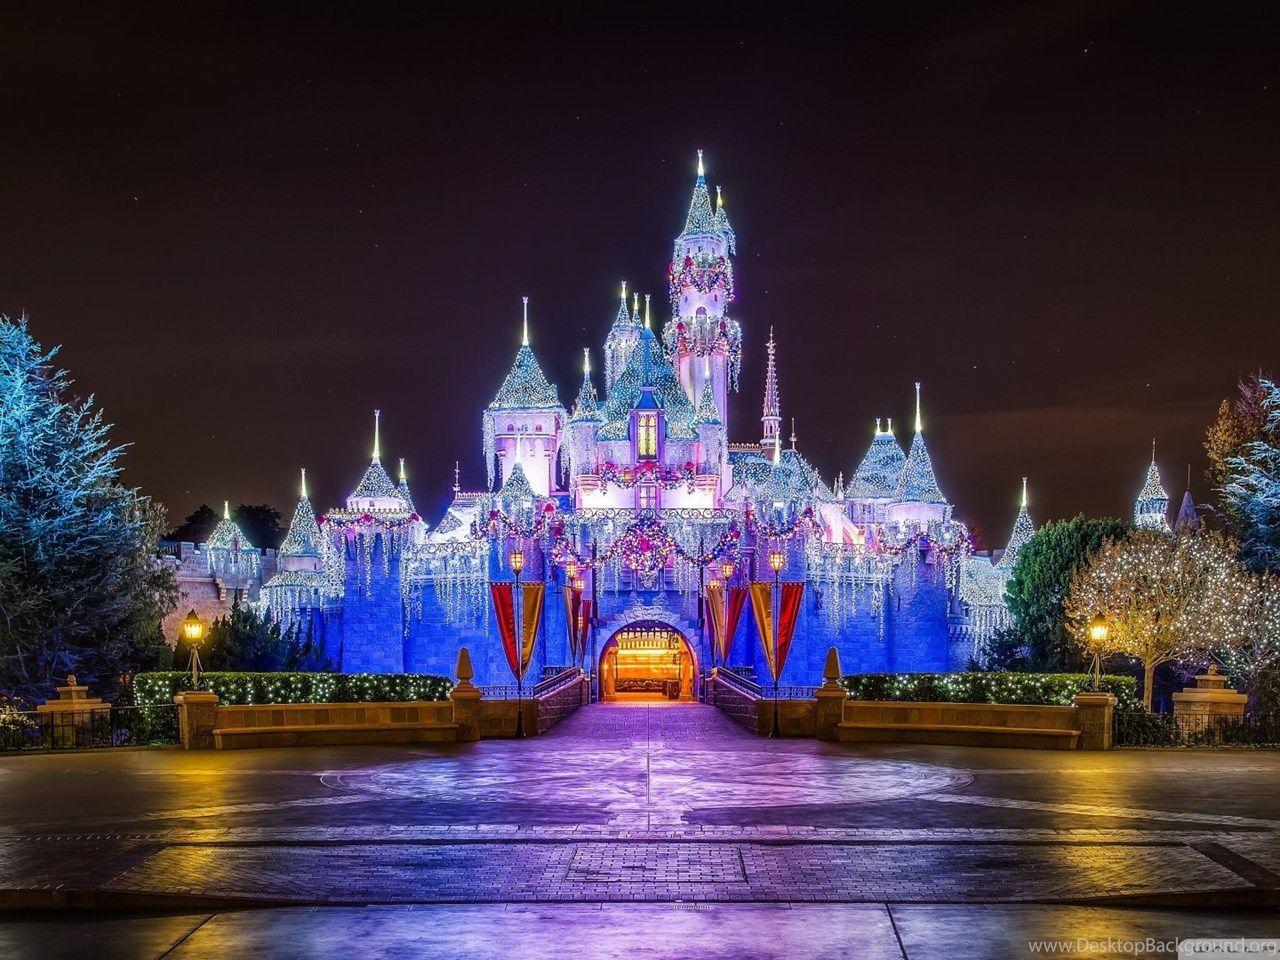 Disneyland Christmas Wallpapers Top Free Disneyland Christmas Backgrounds Wallpaperaccess